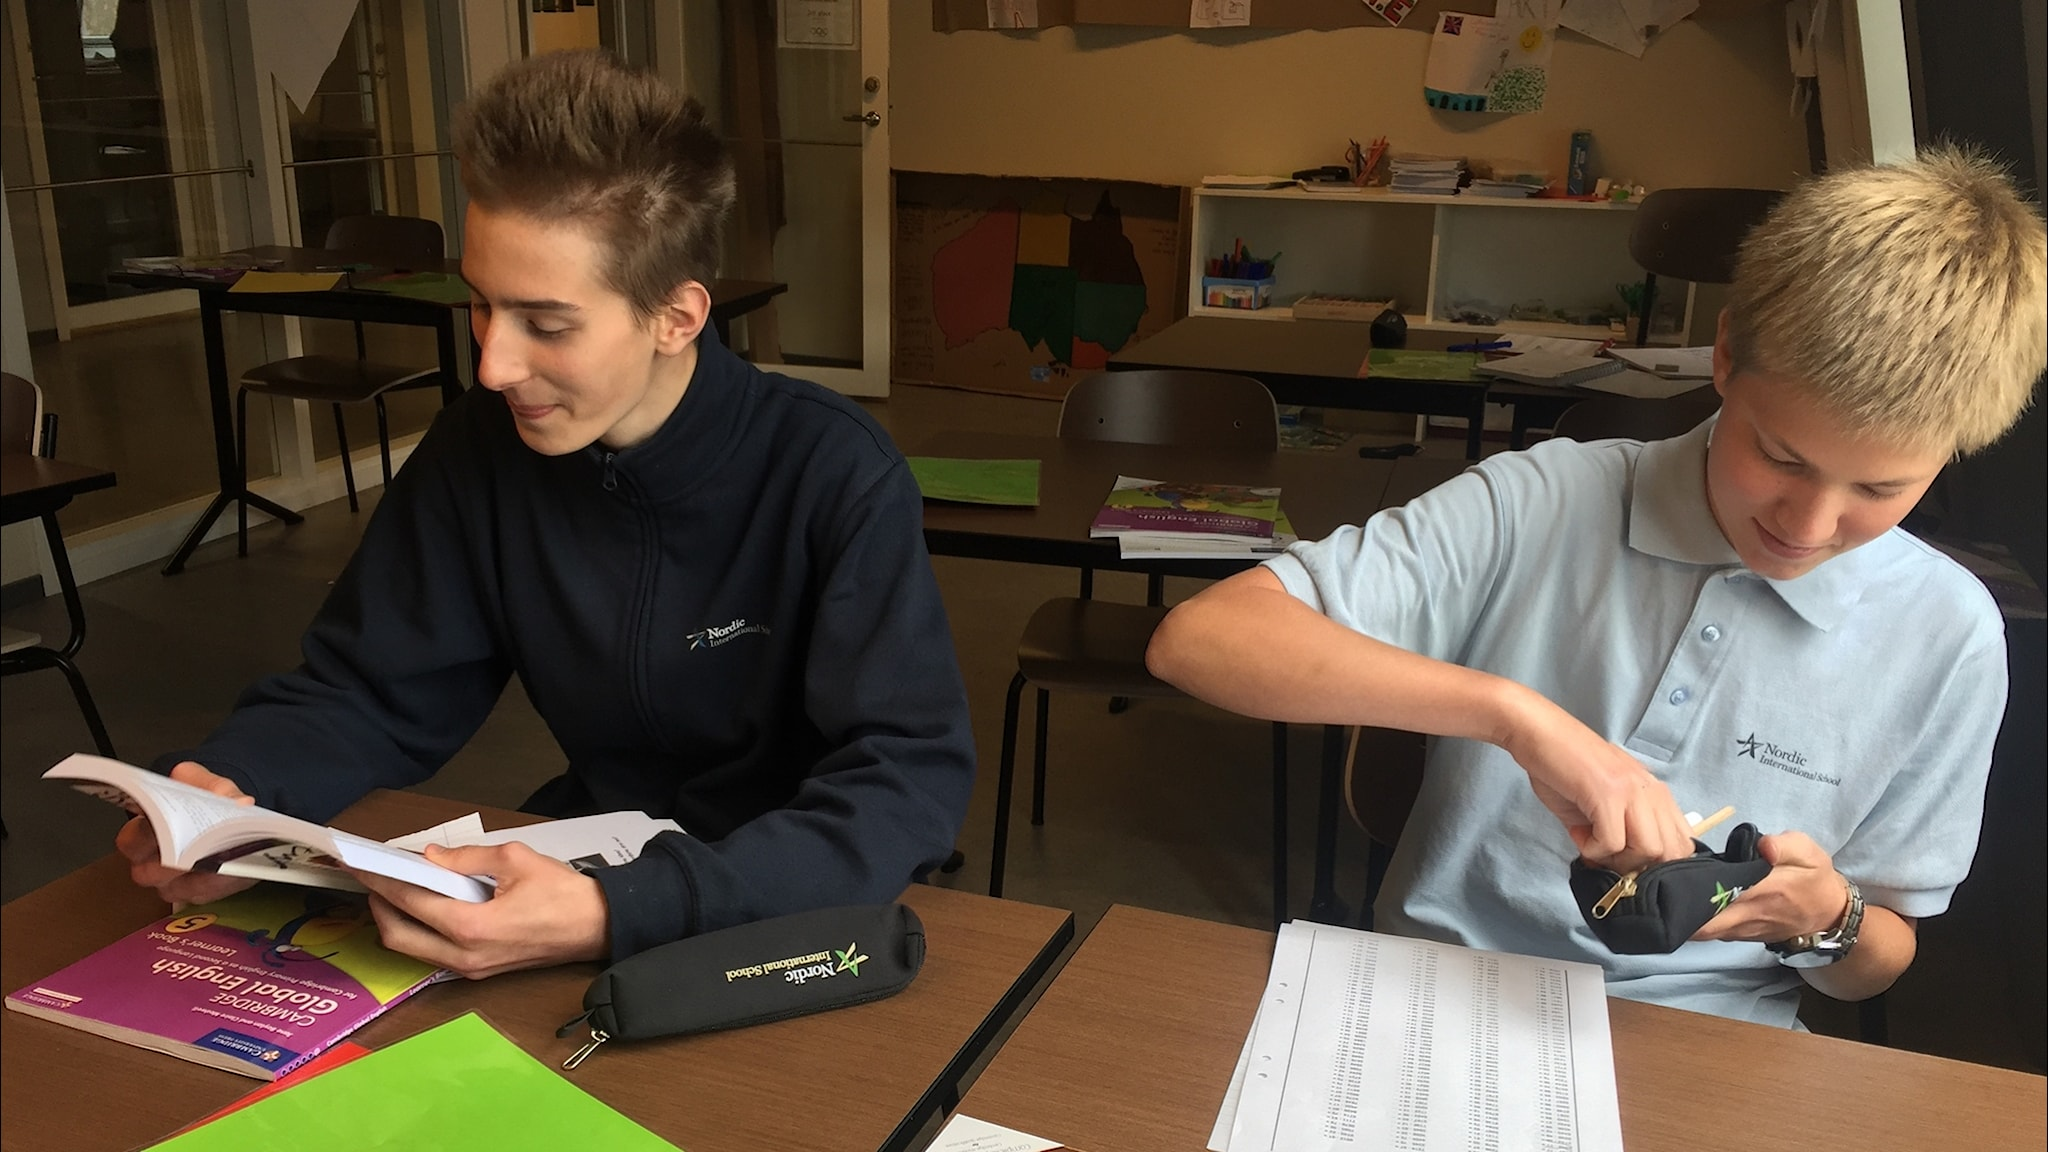 School Denied Permission To Bring In Uniforms Radio